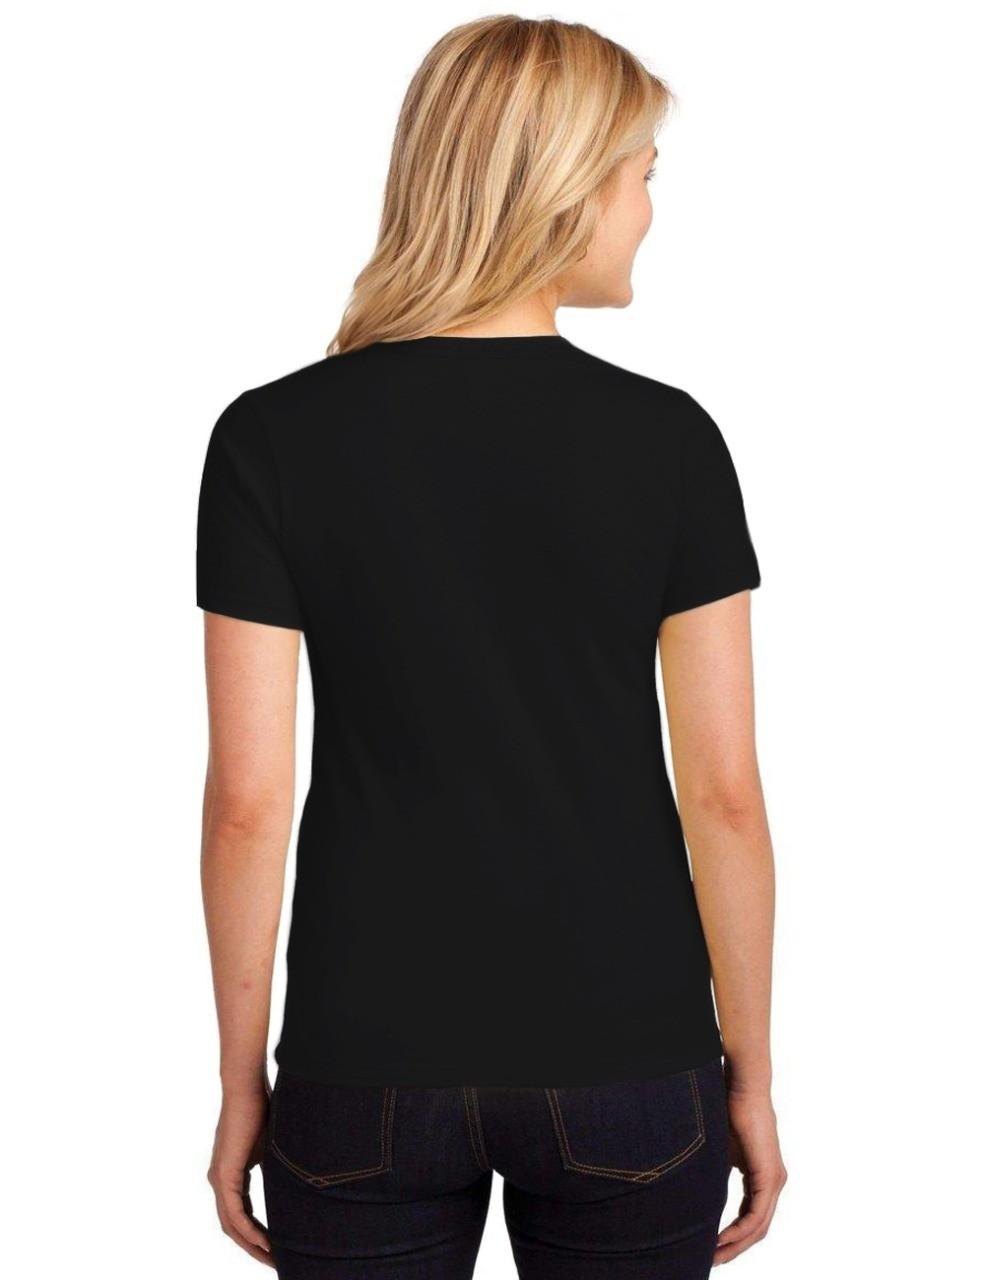 Camiseta Feminina T-Shirt Full Printed Banda Megadeth Baby Look FP_009